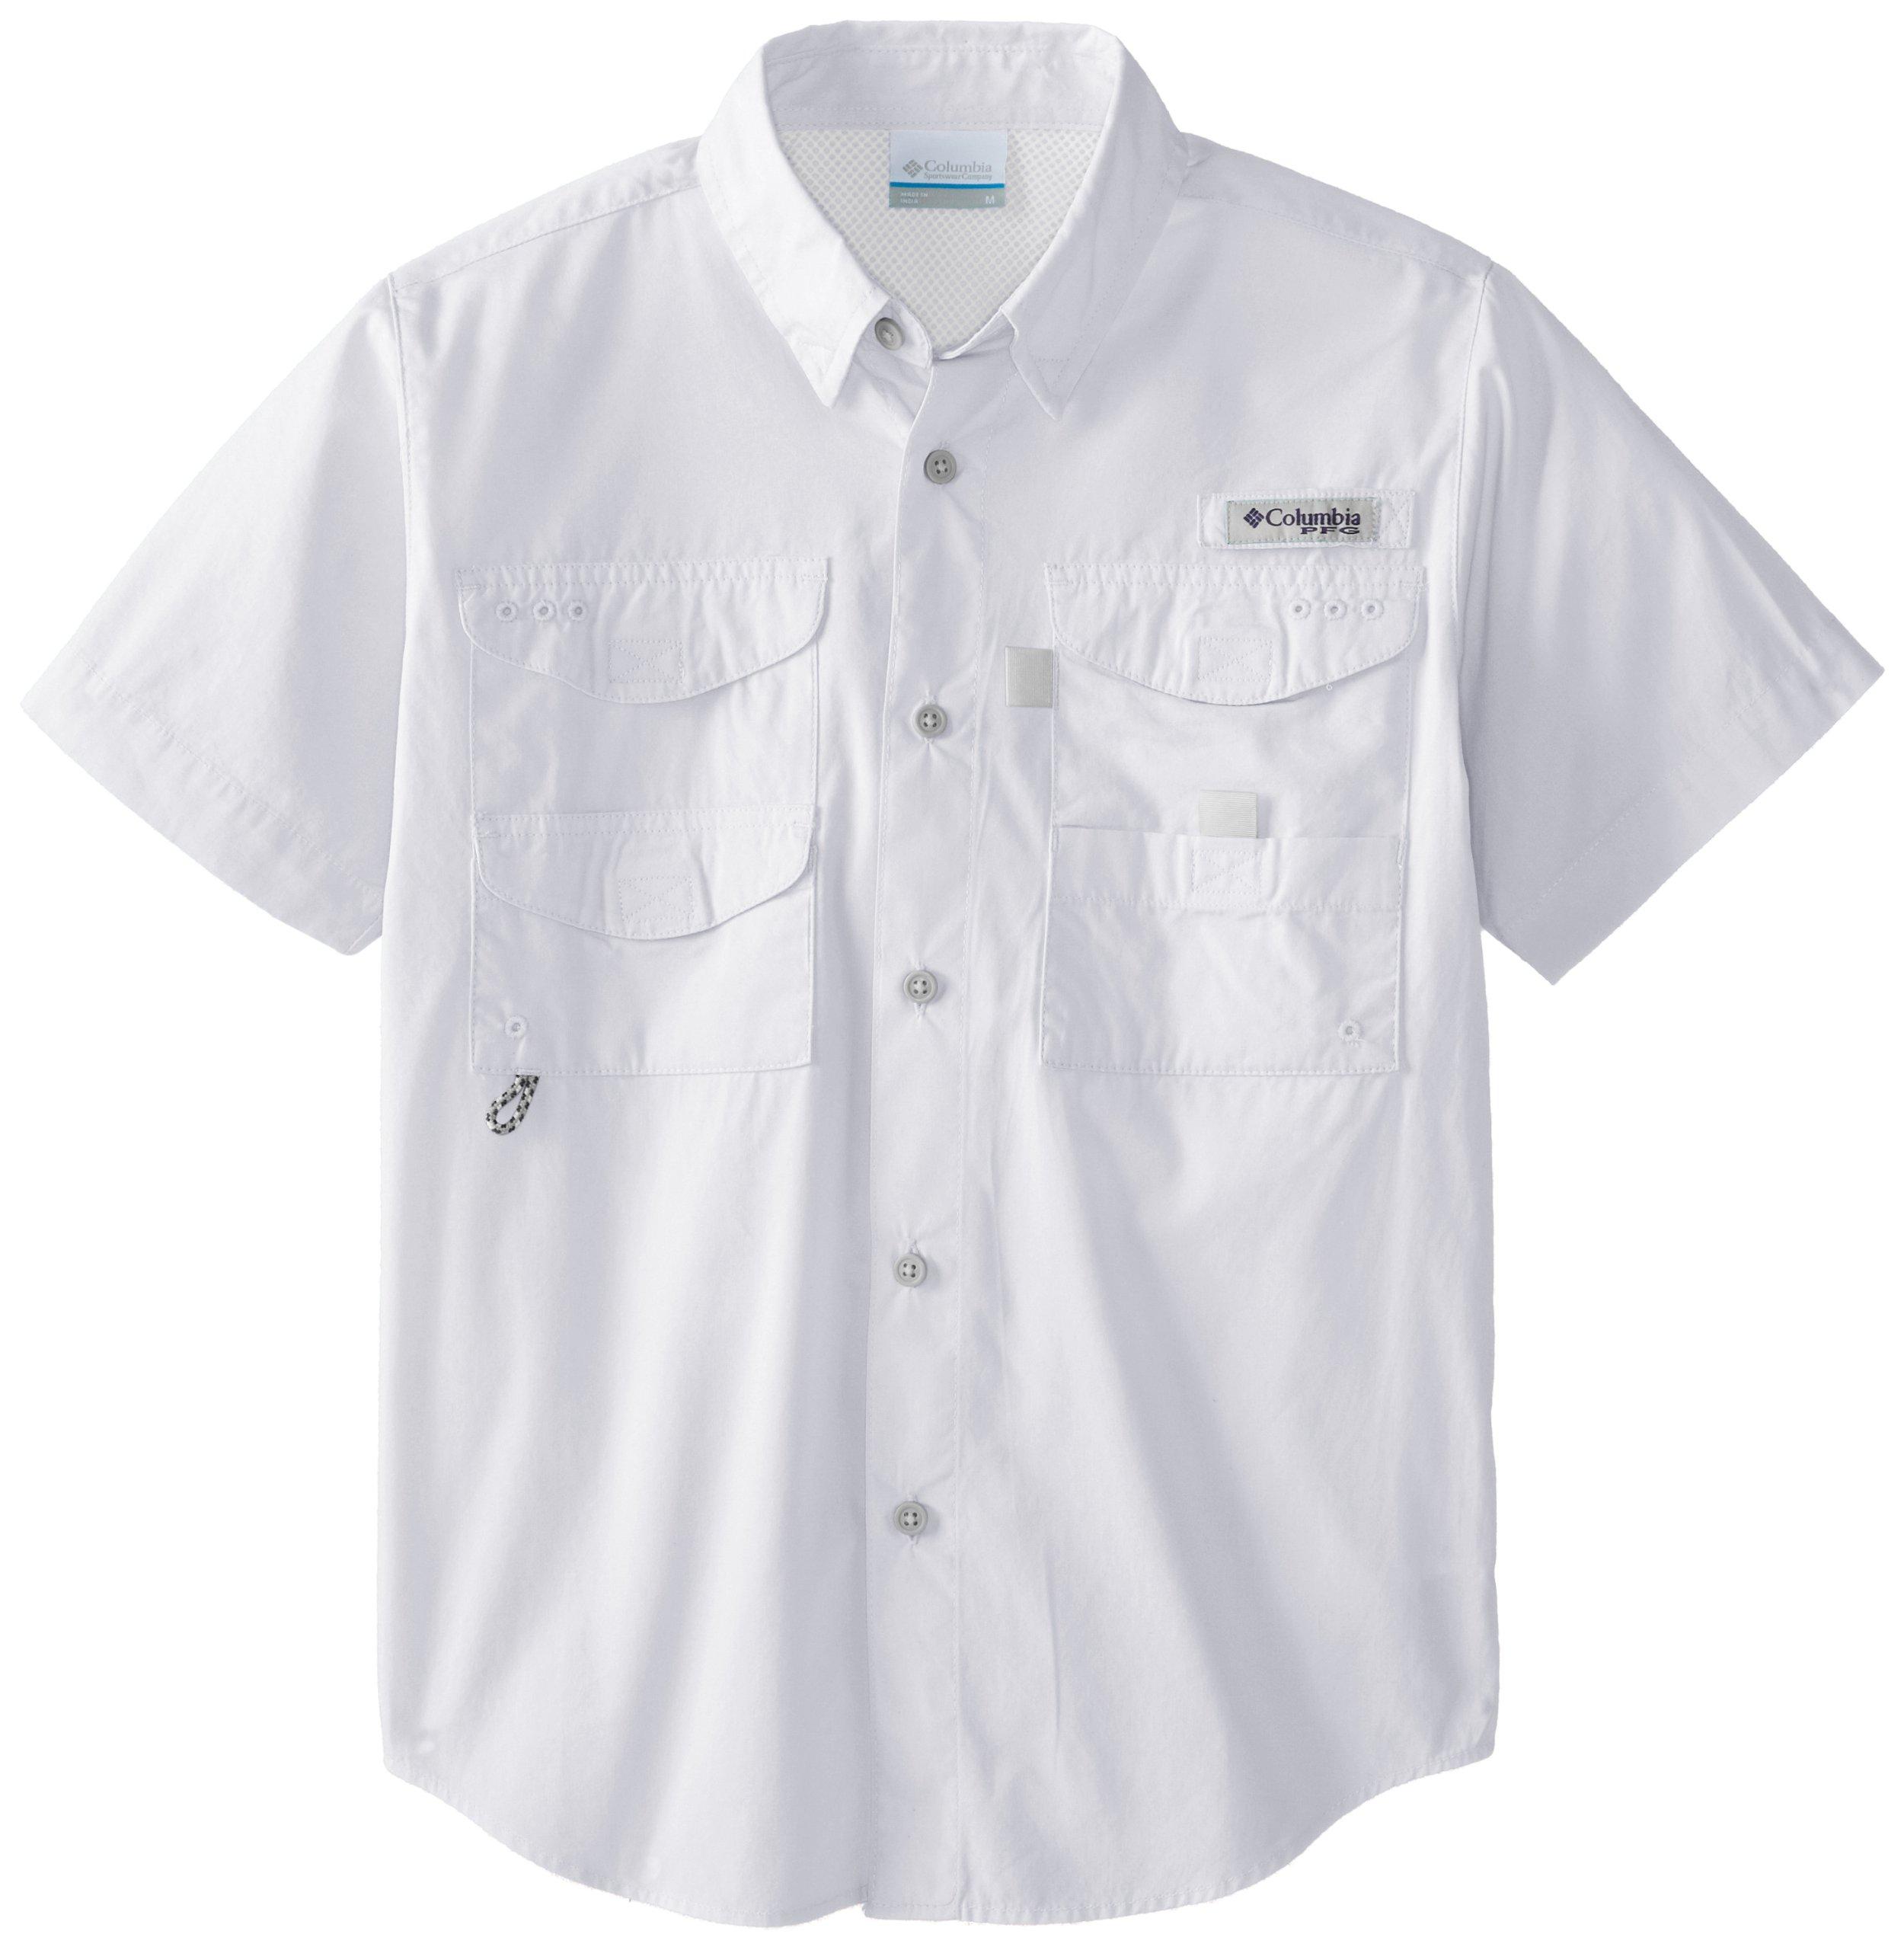 Columbia Youth Boys PFG Bonehead Short Sleeve Shirt, Cotton, Relaxed Fit, White, X-Small